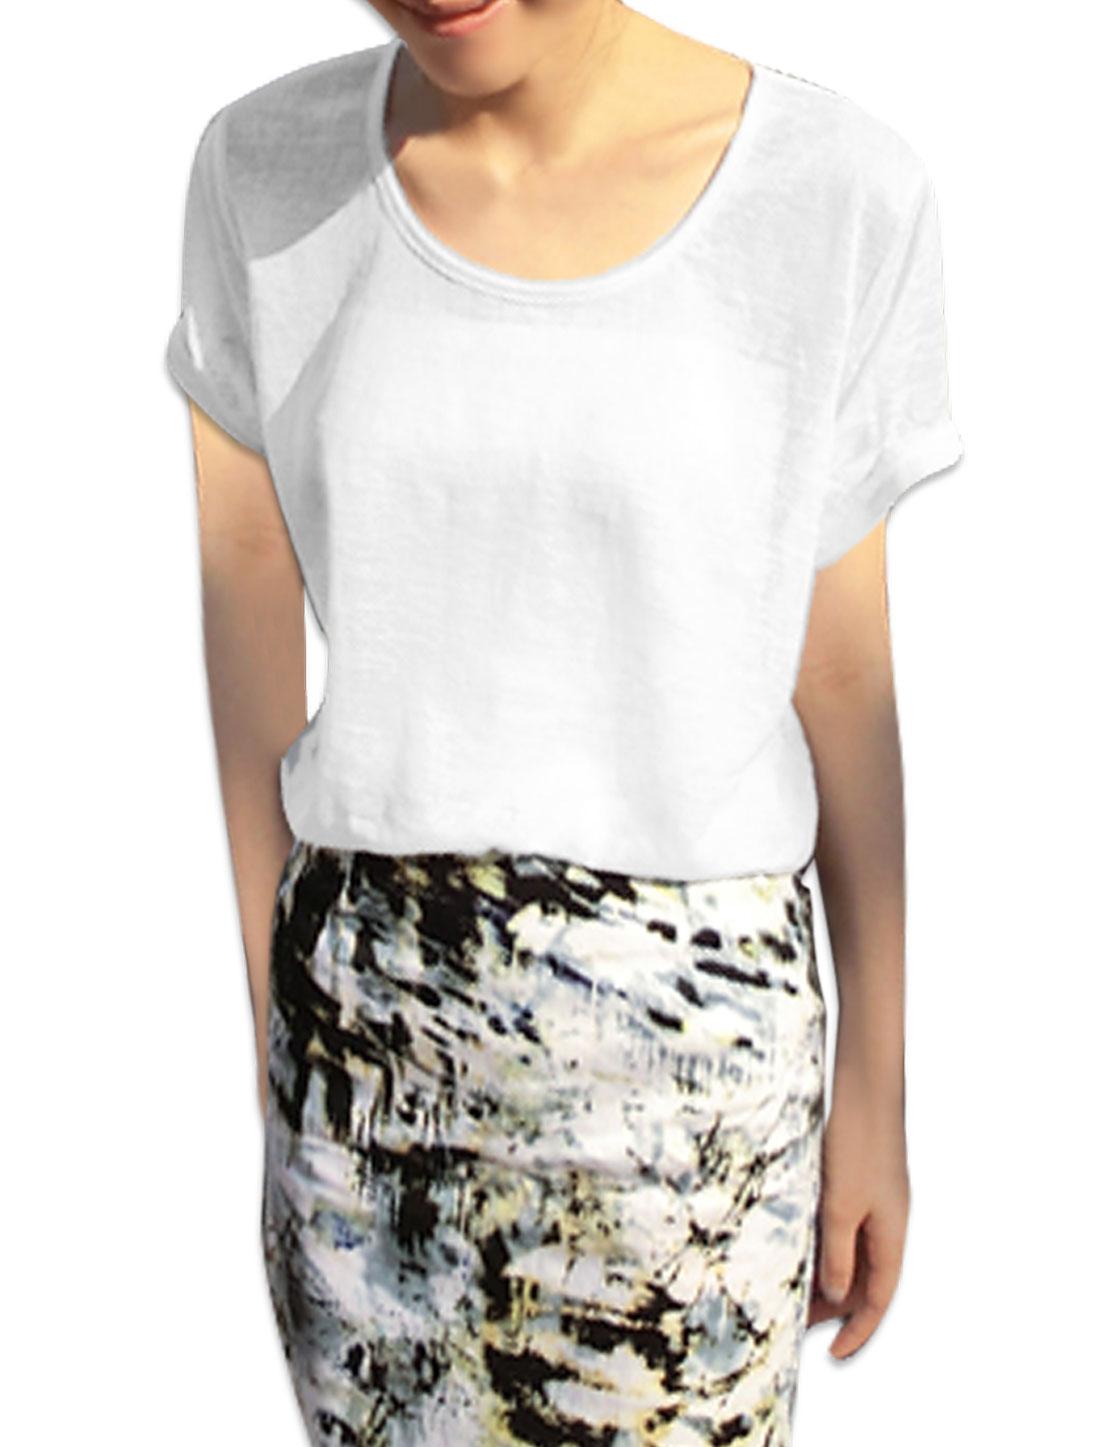 Women Strapless Plain Soft Tube Top w Semi Sheer T-Shirt XS White